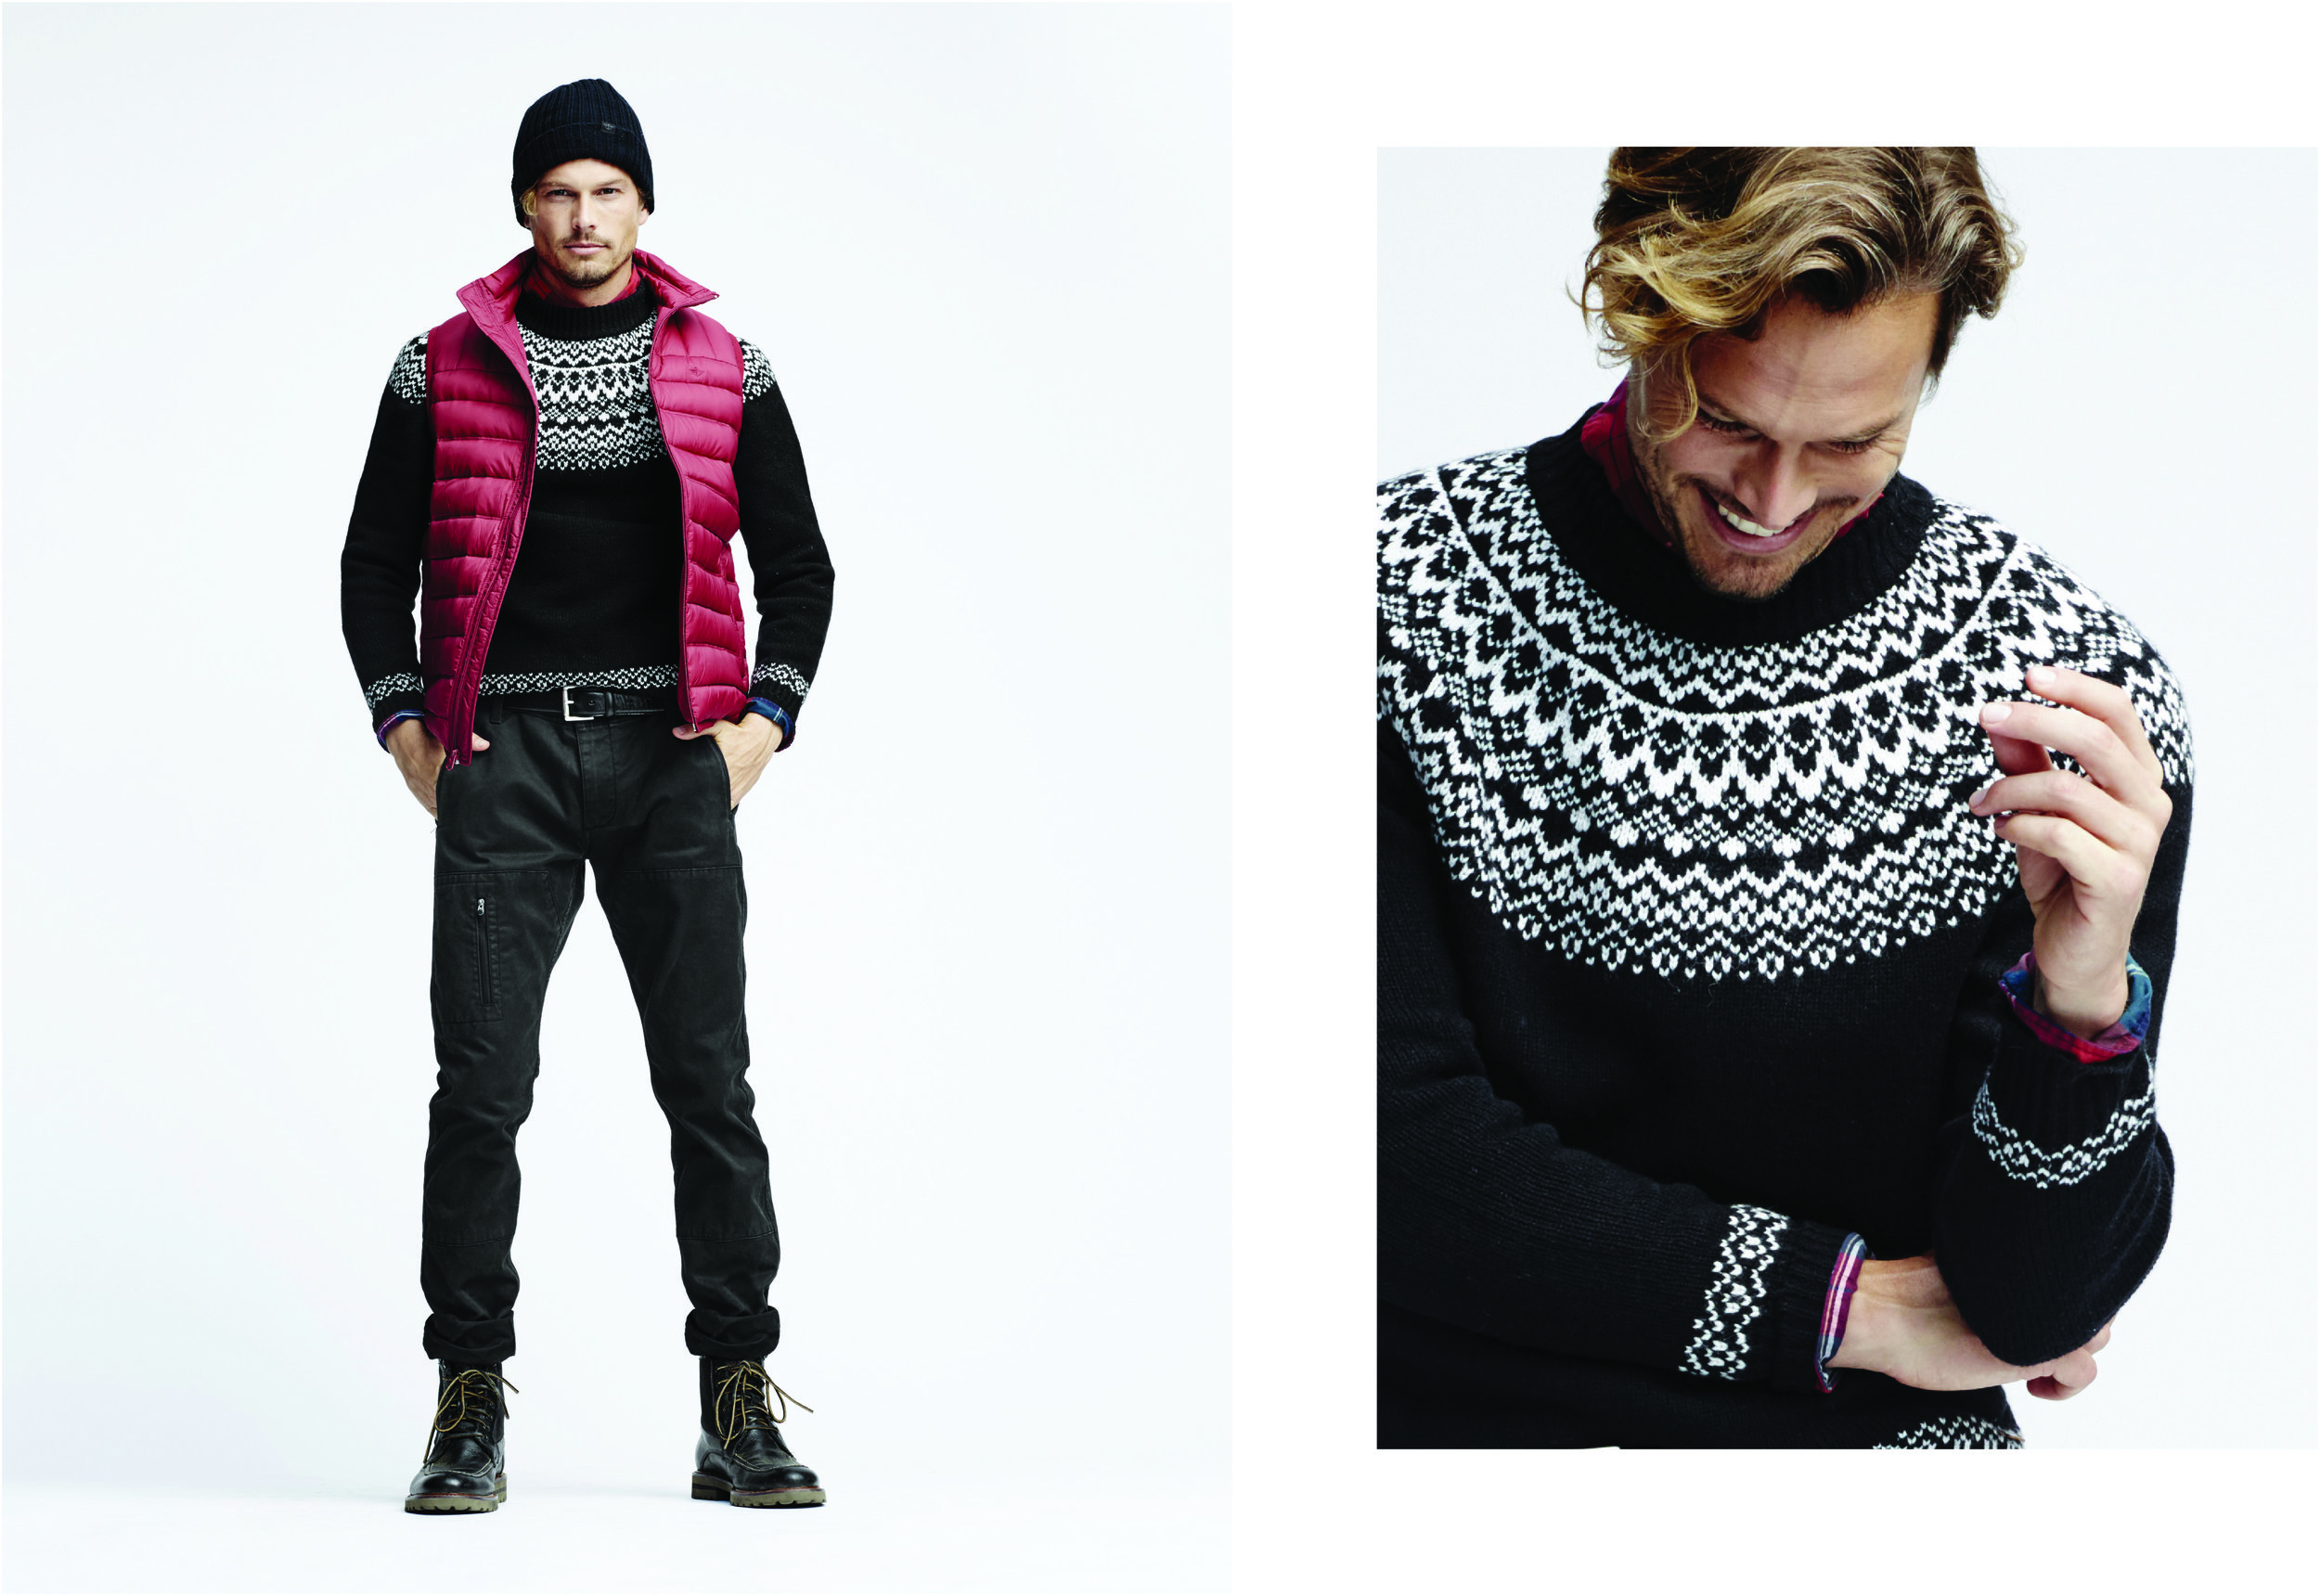 Venita_Venita Stylist_Fashion Stylist_Stephanie Stimmler_Menswear Stylist_Designer_15.jpg